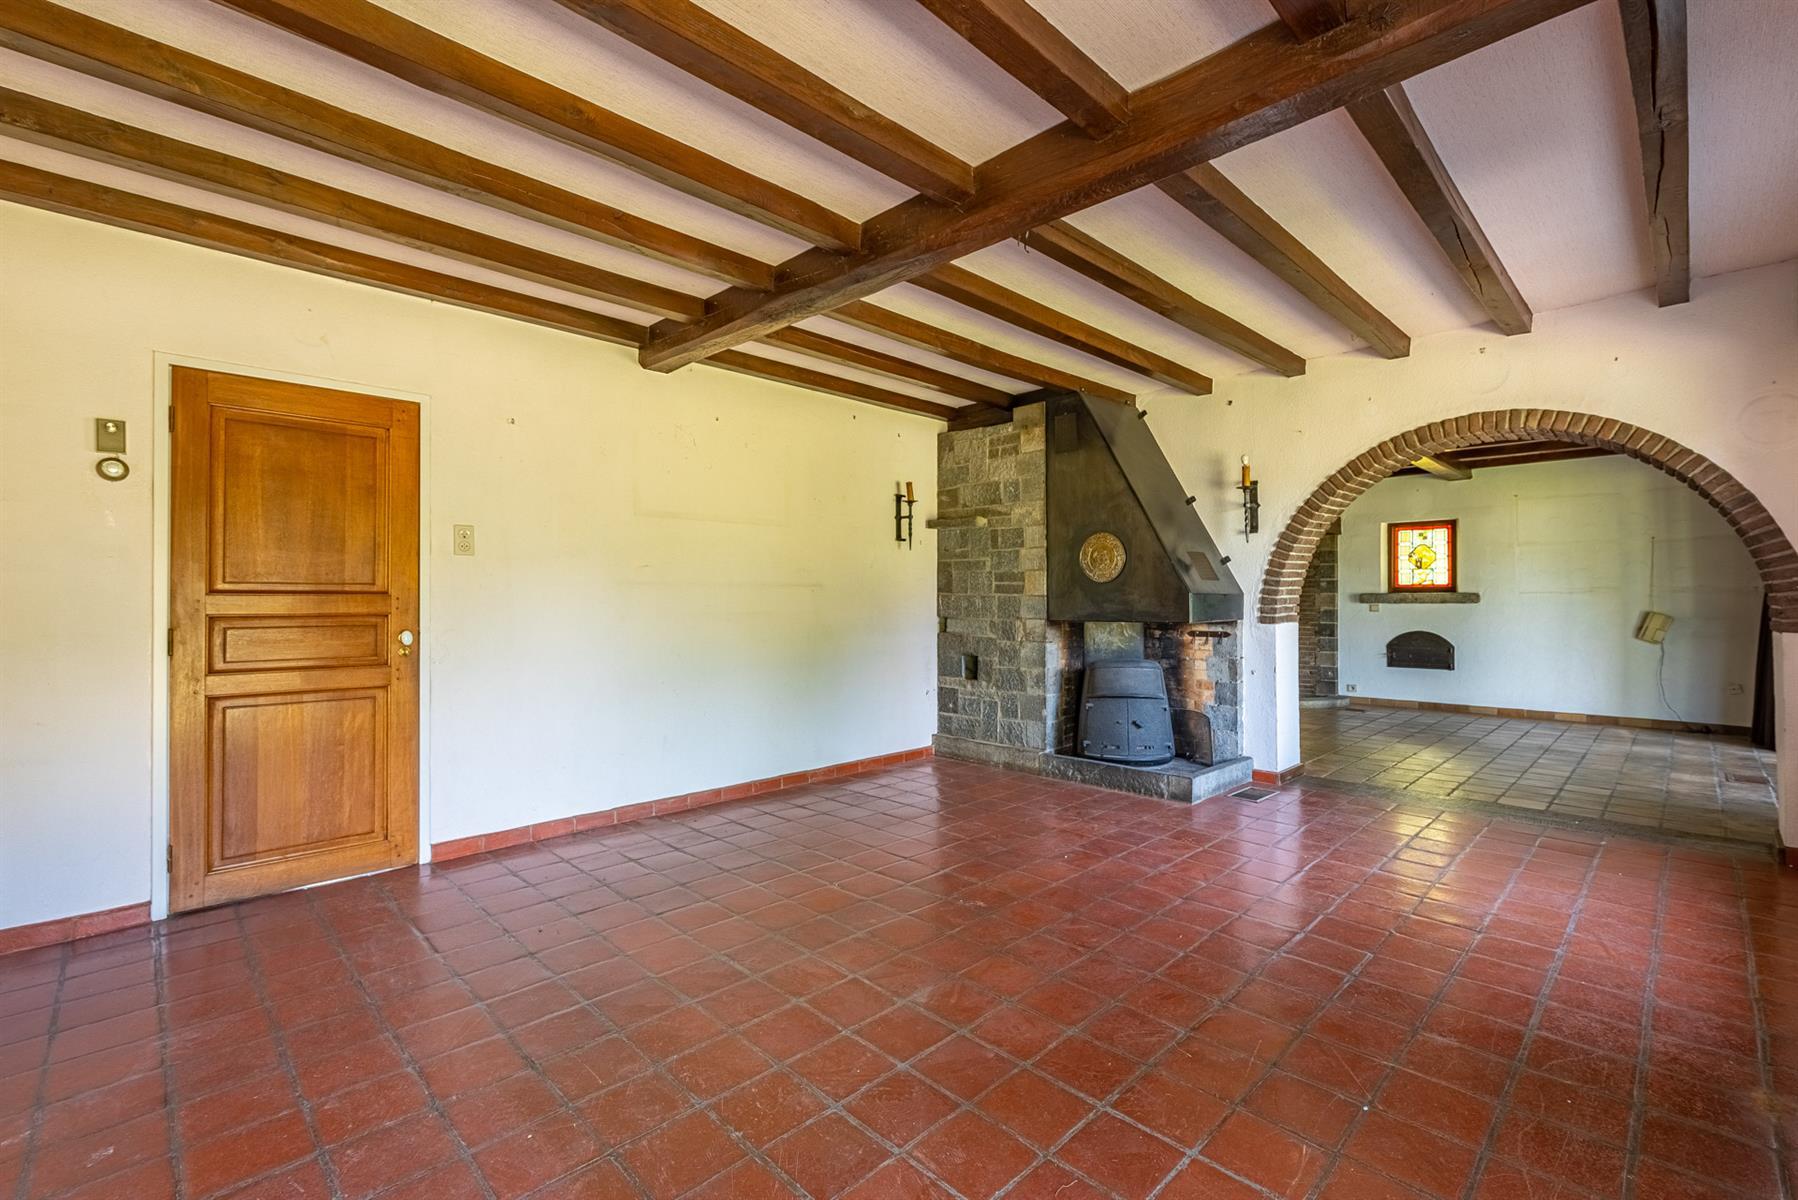 Huis - Rochefort Wavreille - #4362771-11